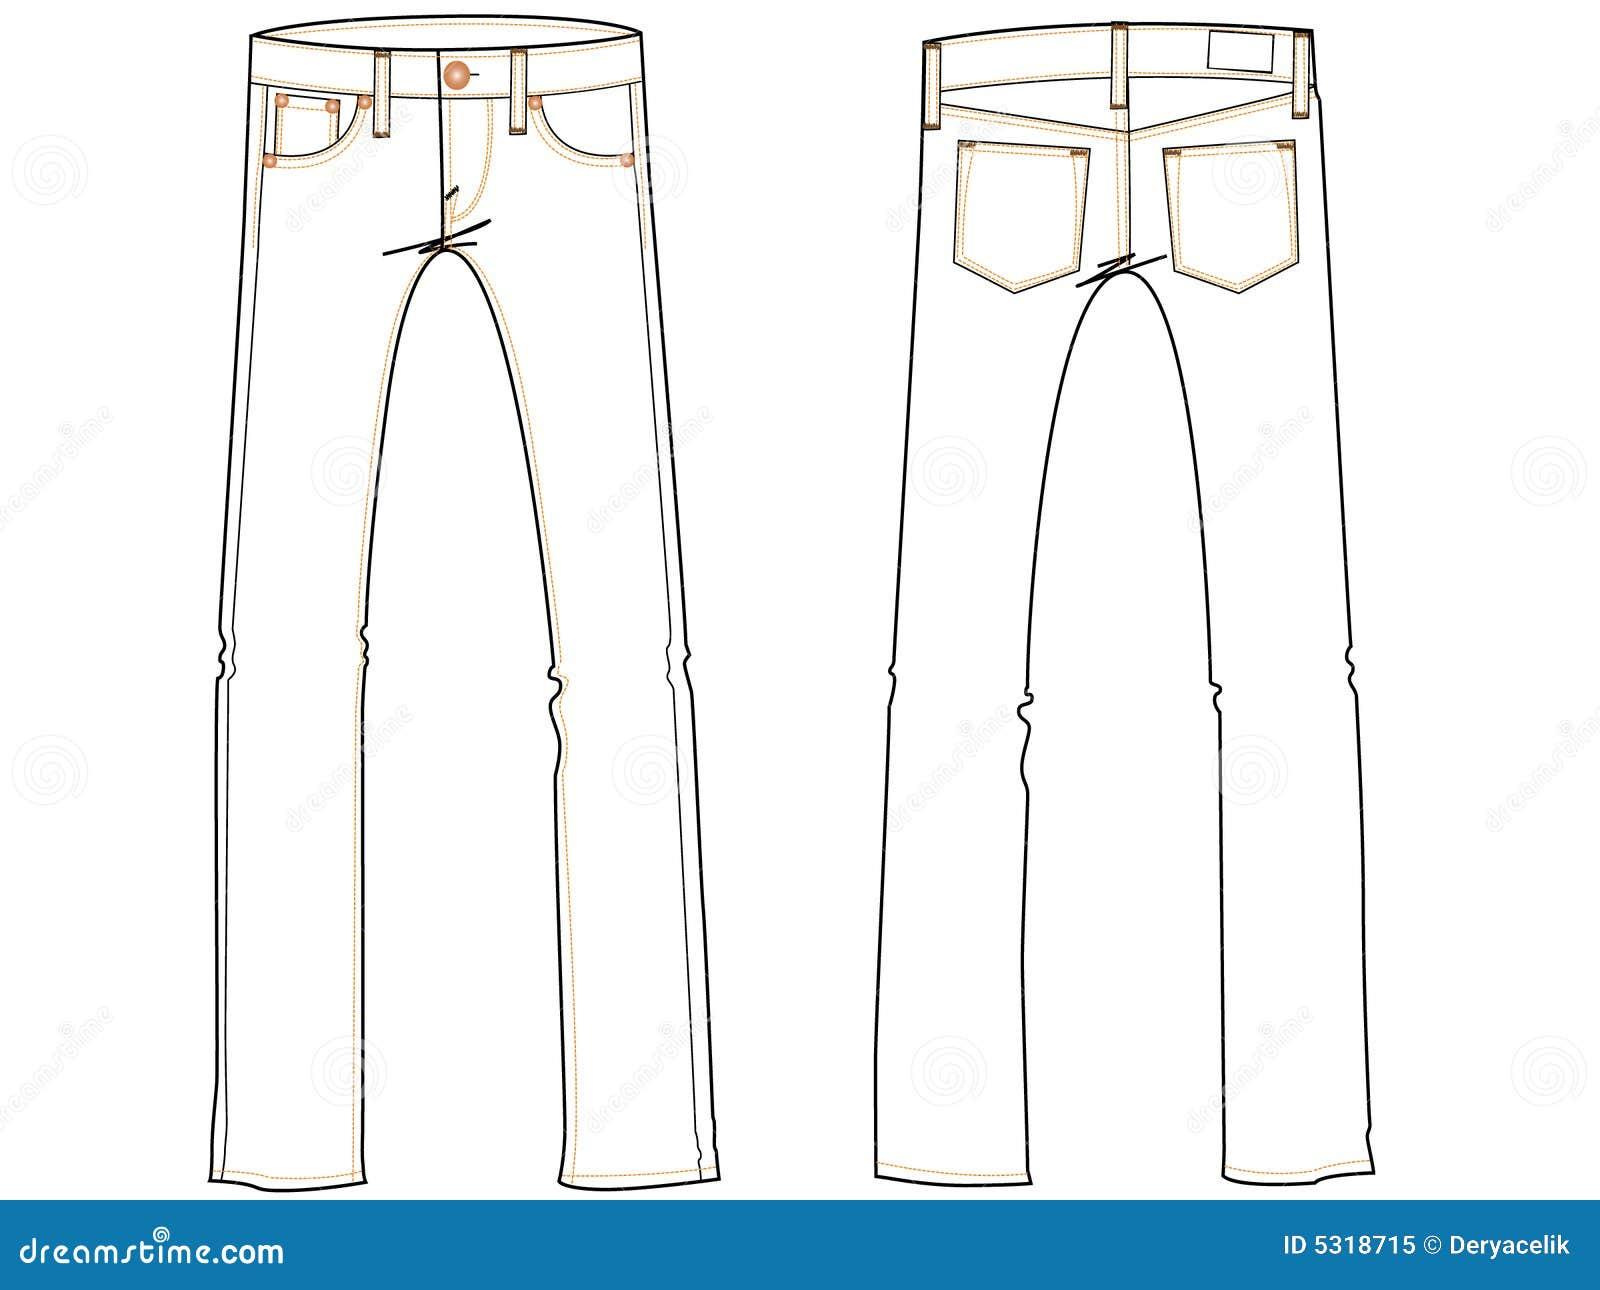 Basic Jeans Drawing Illustrati Royalty Free Stock Photo ...